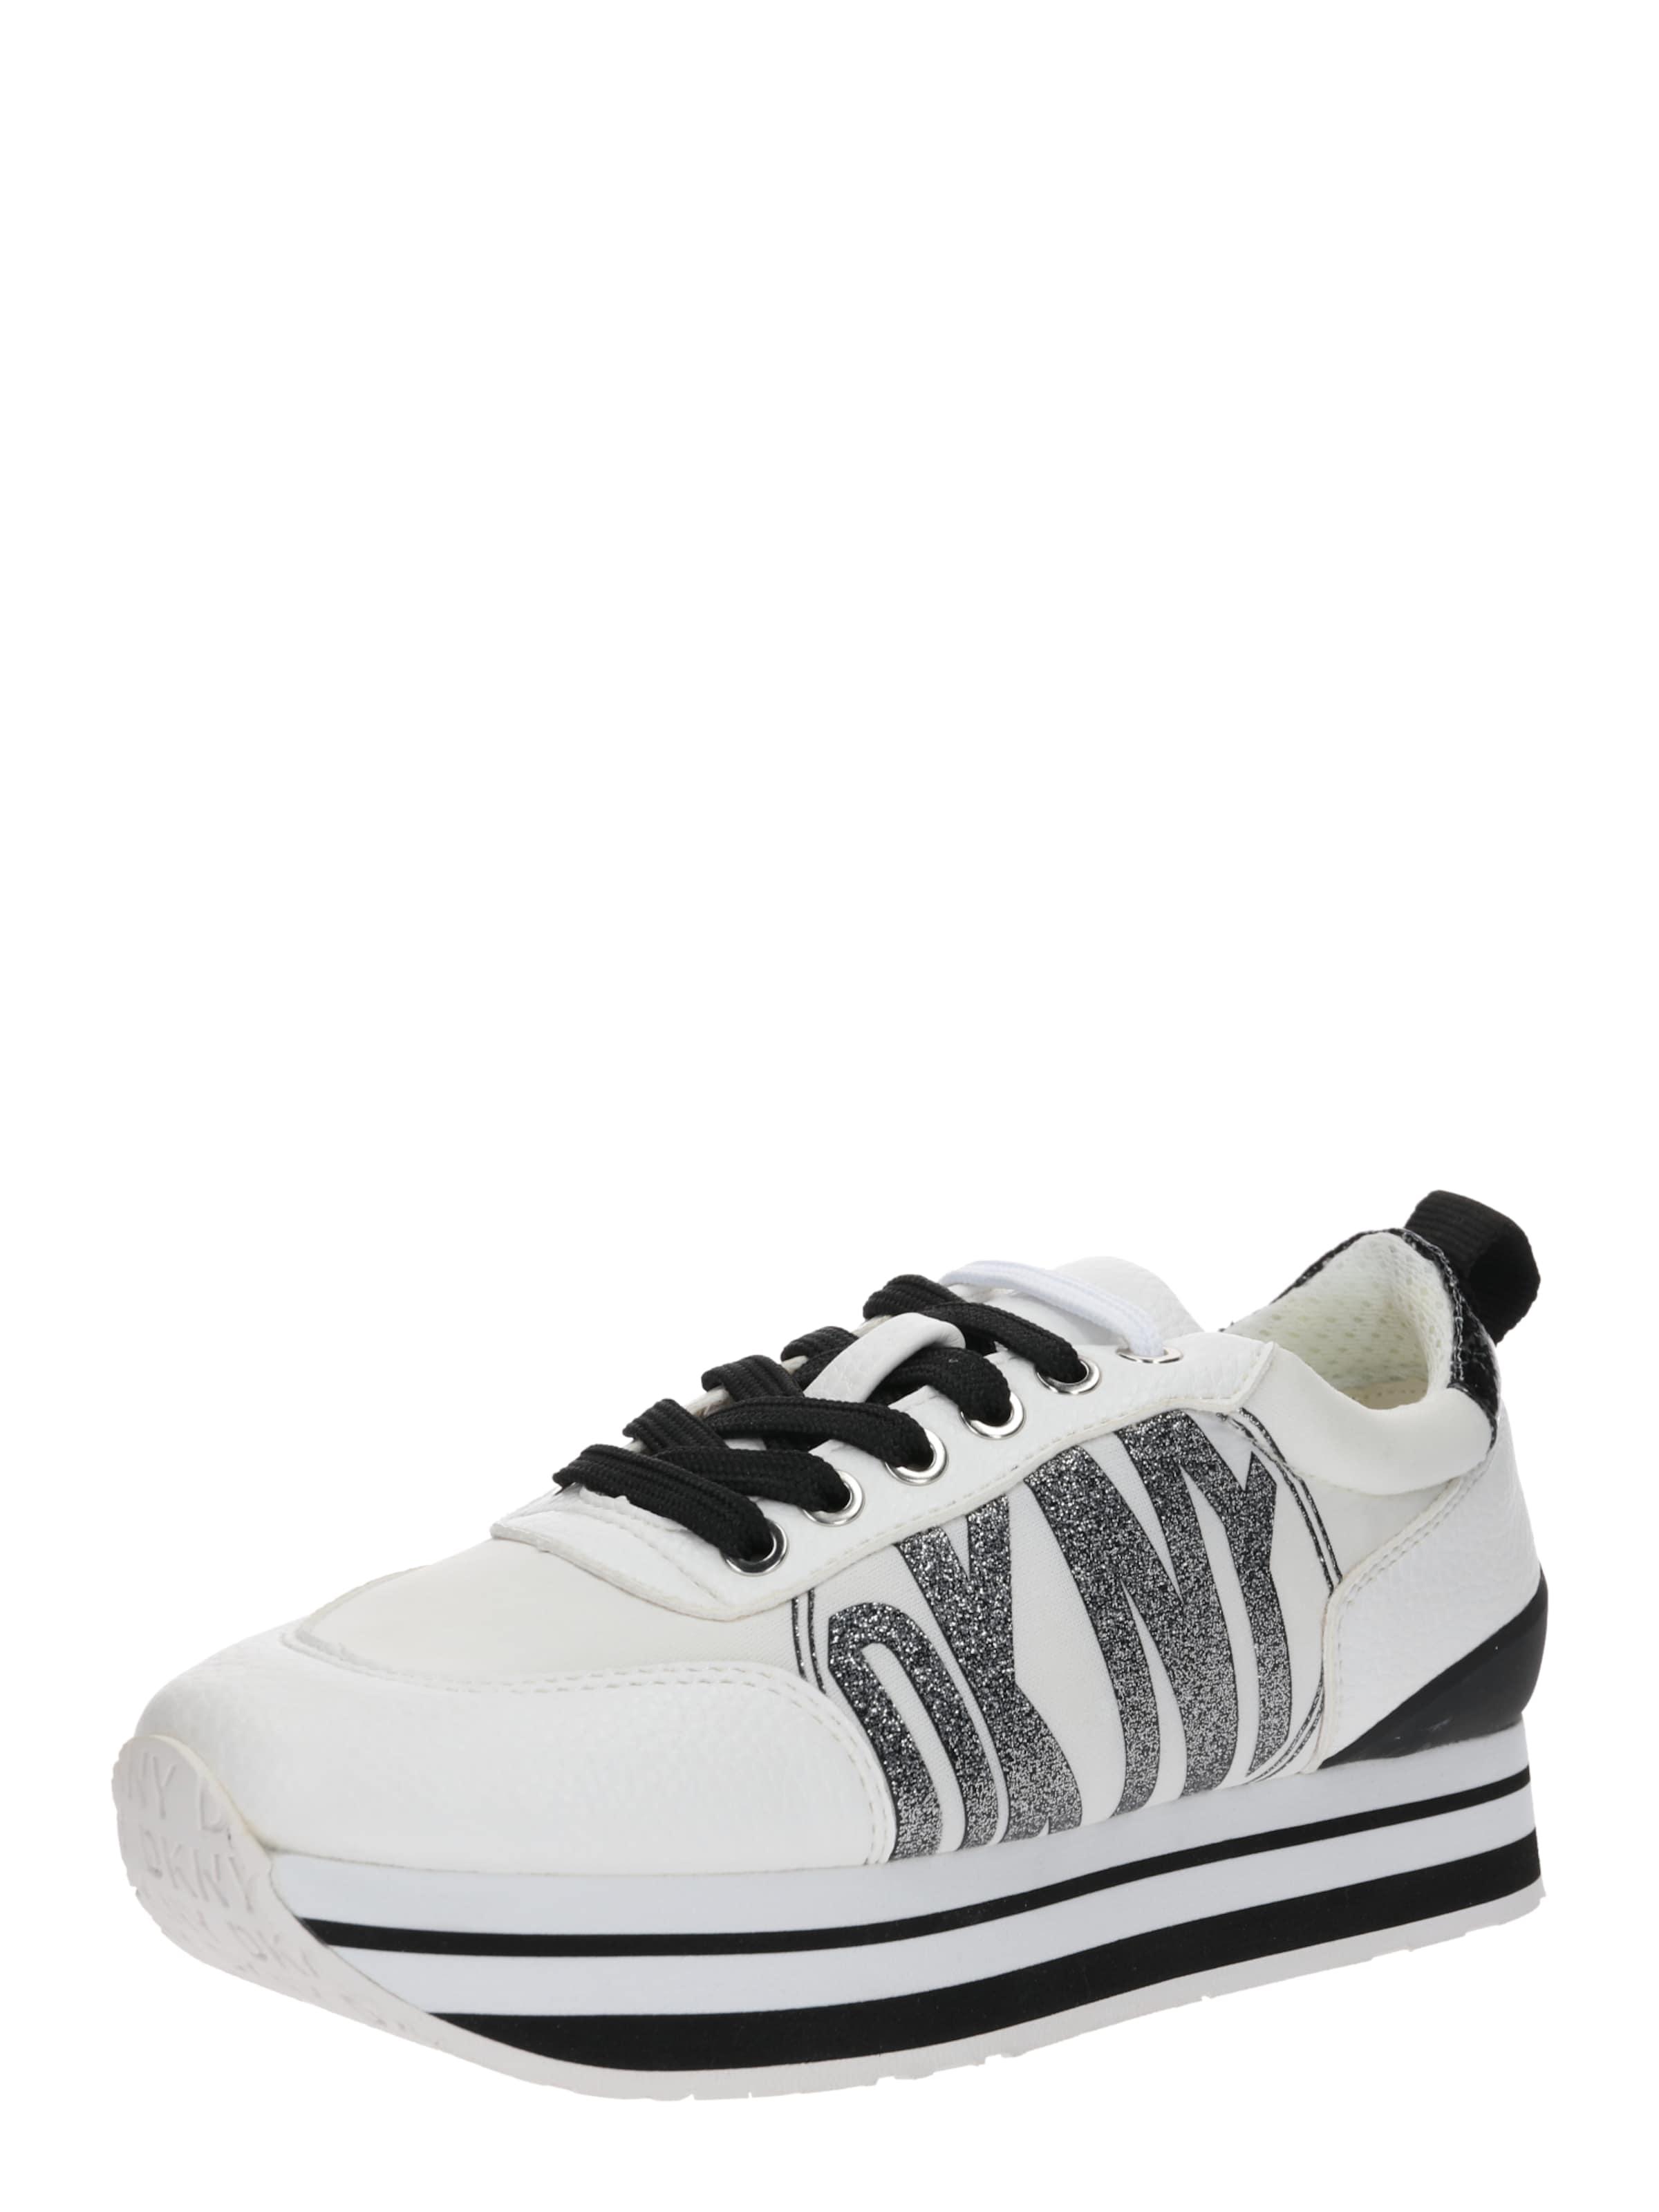 Lace En Sneaker' Dkny NoirBlanc 'panya Basses Baskets Up – N0nm8Ovw